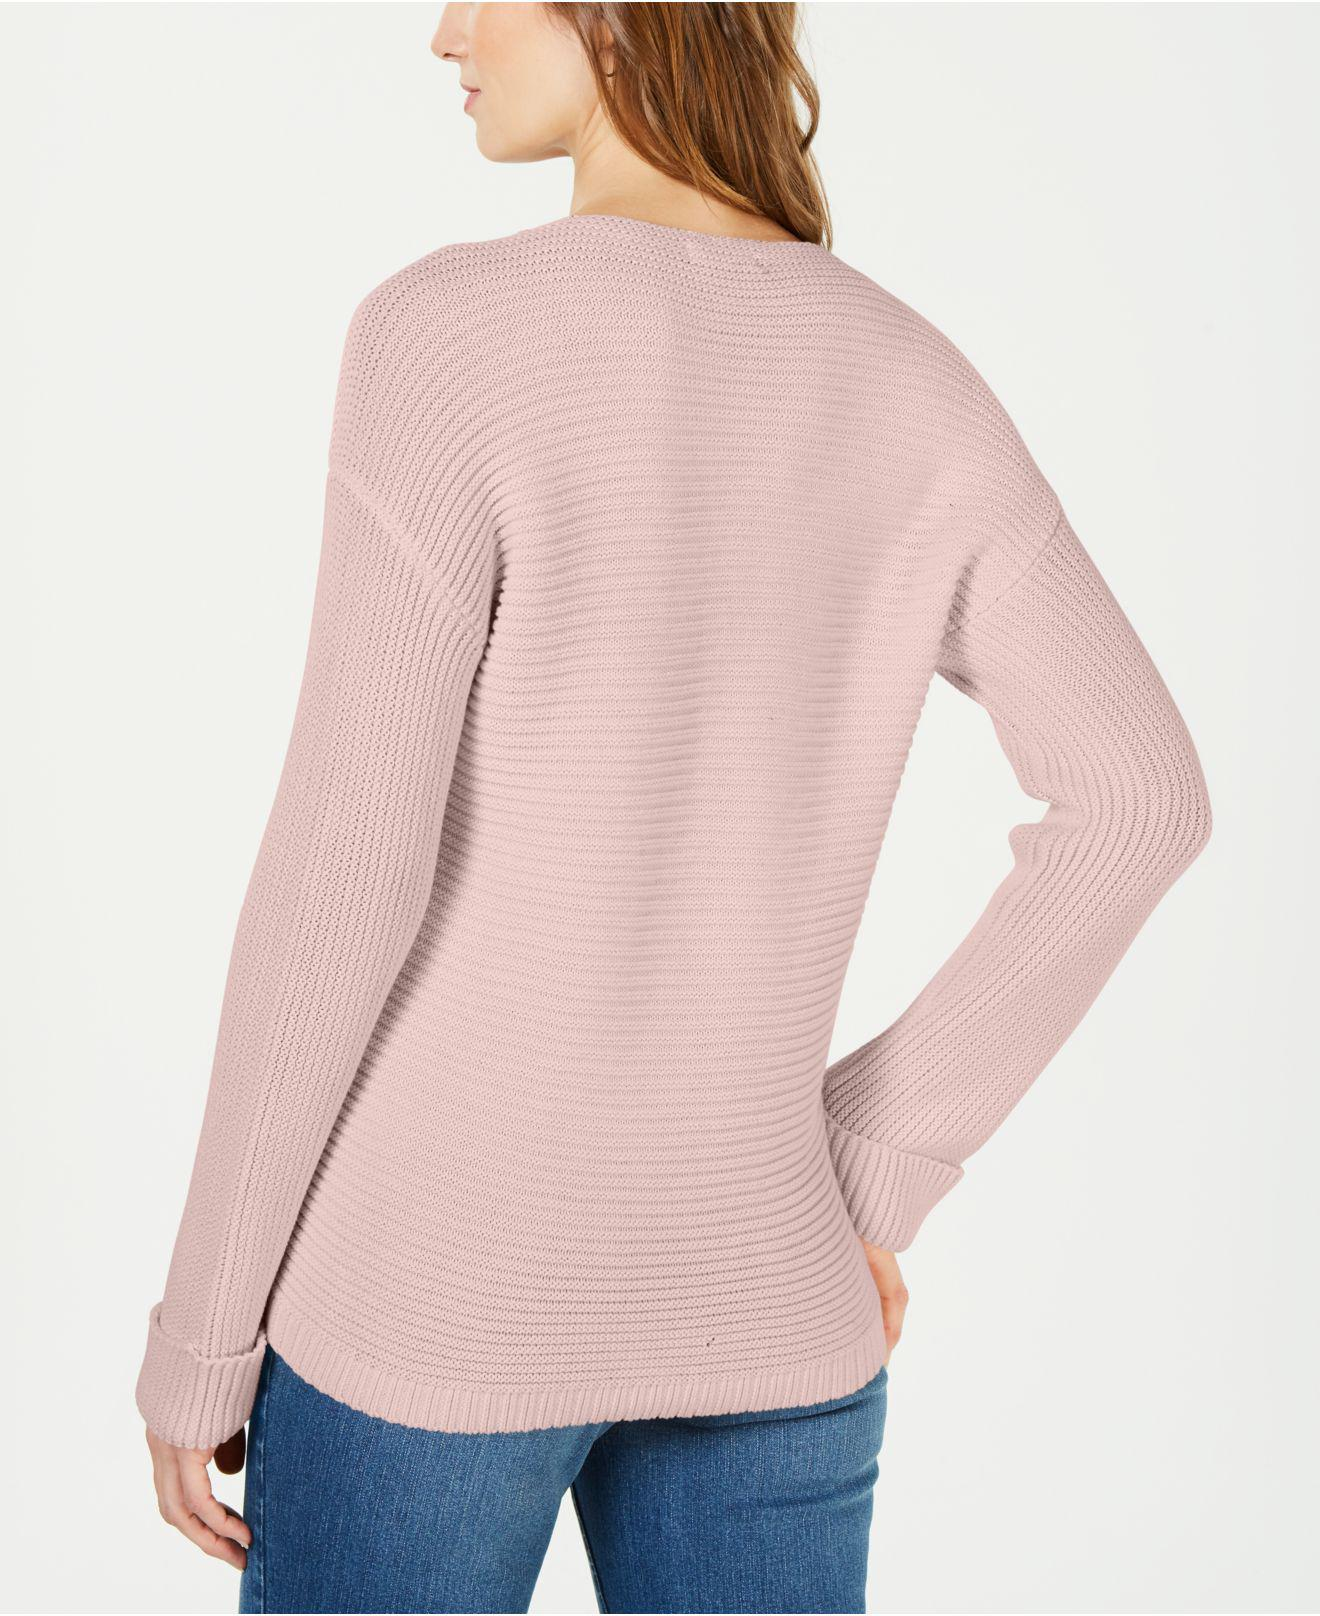 Cuffed Sweaters: Charter Club Cotton V-neck Cuffed-sleeve Sweater, Created